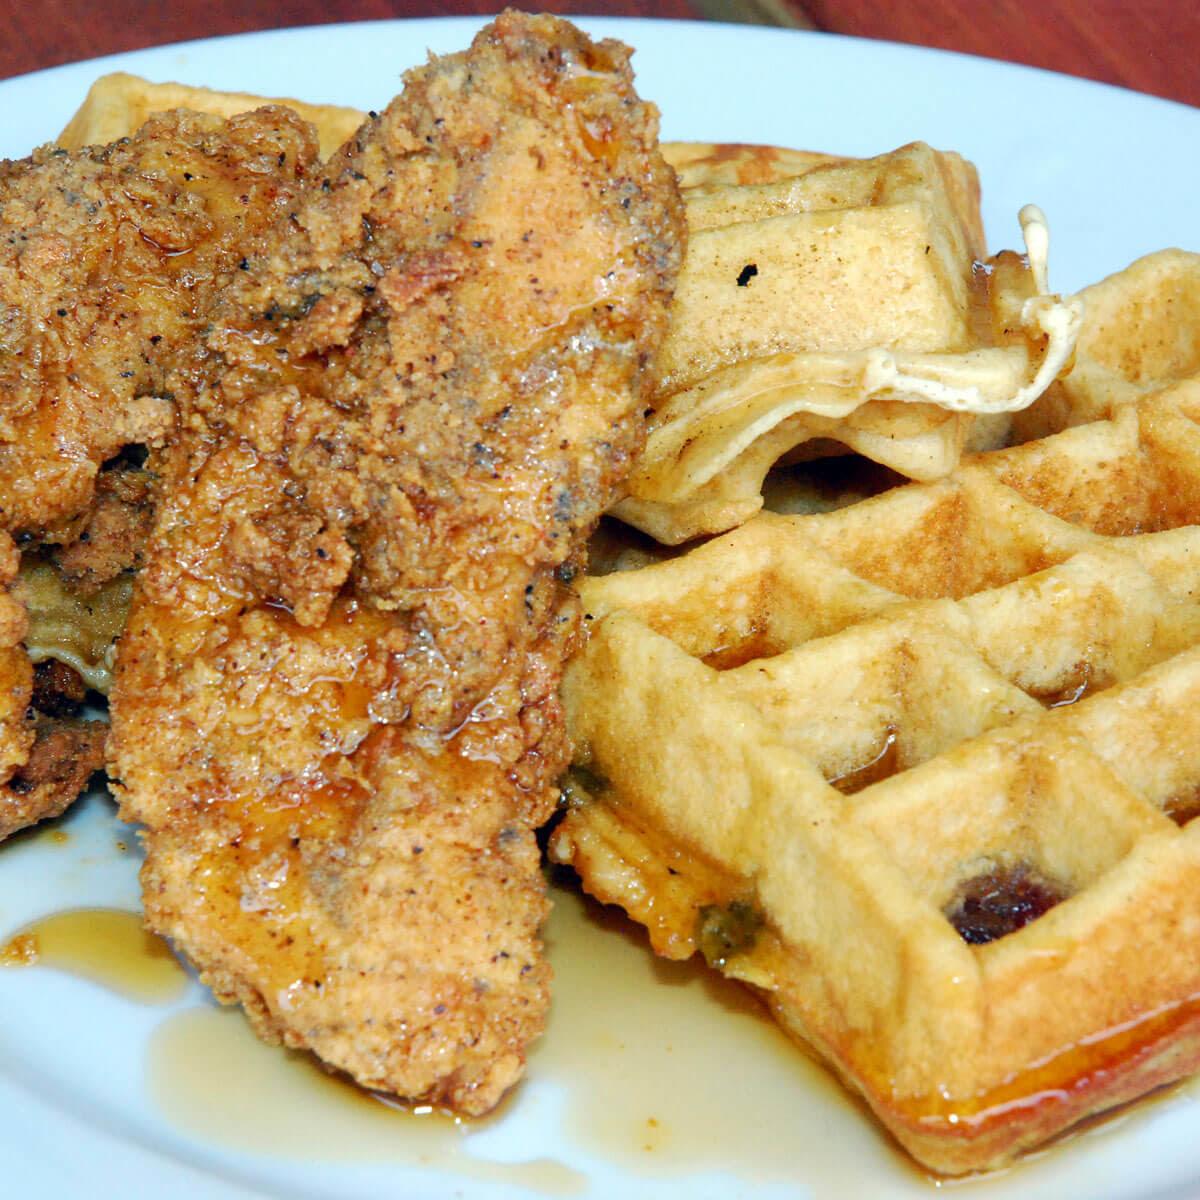 The best restaurants in Dallas for a gluten-free feast ...